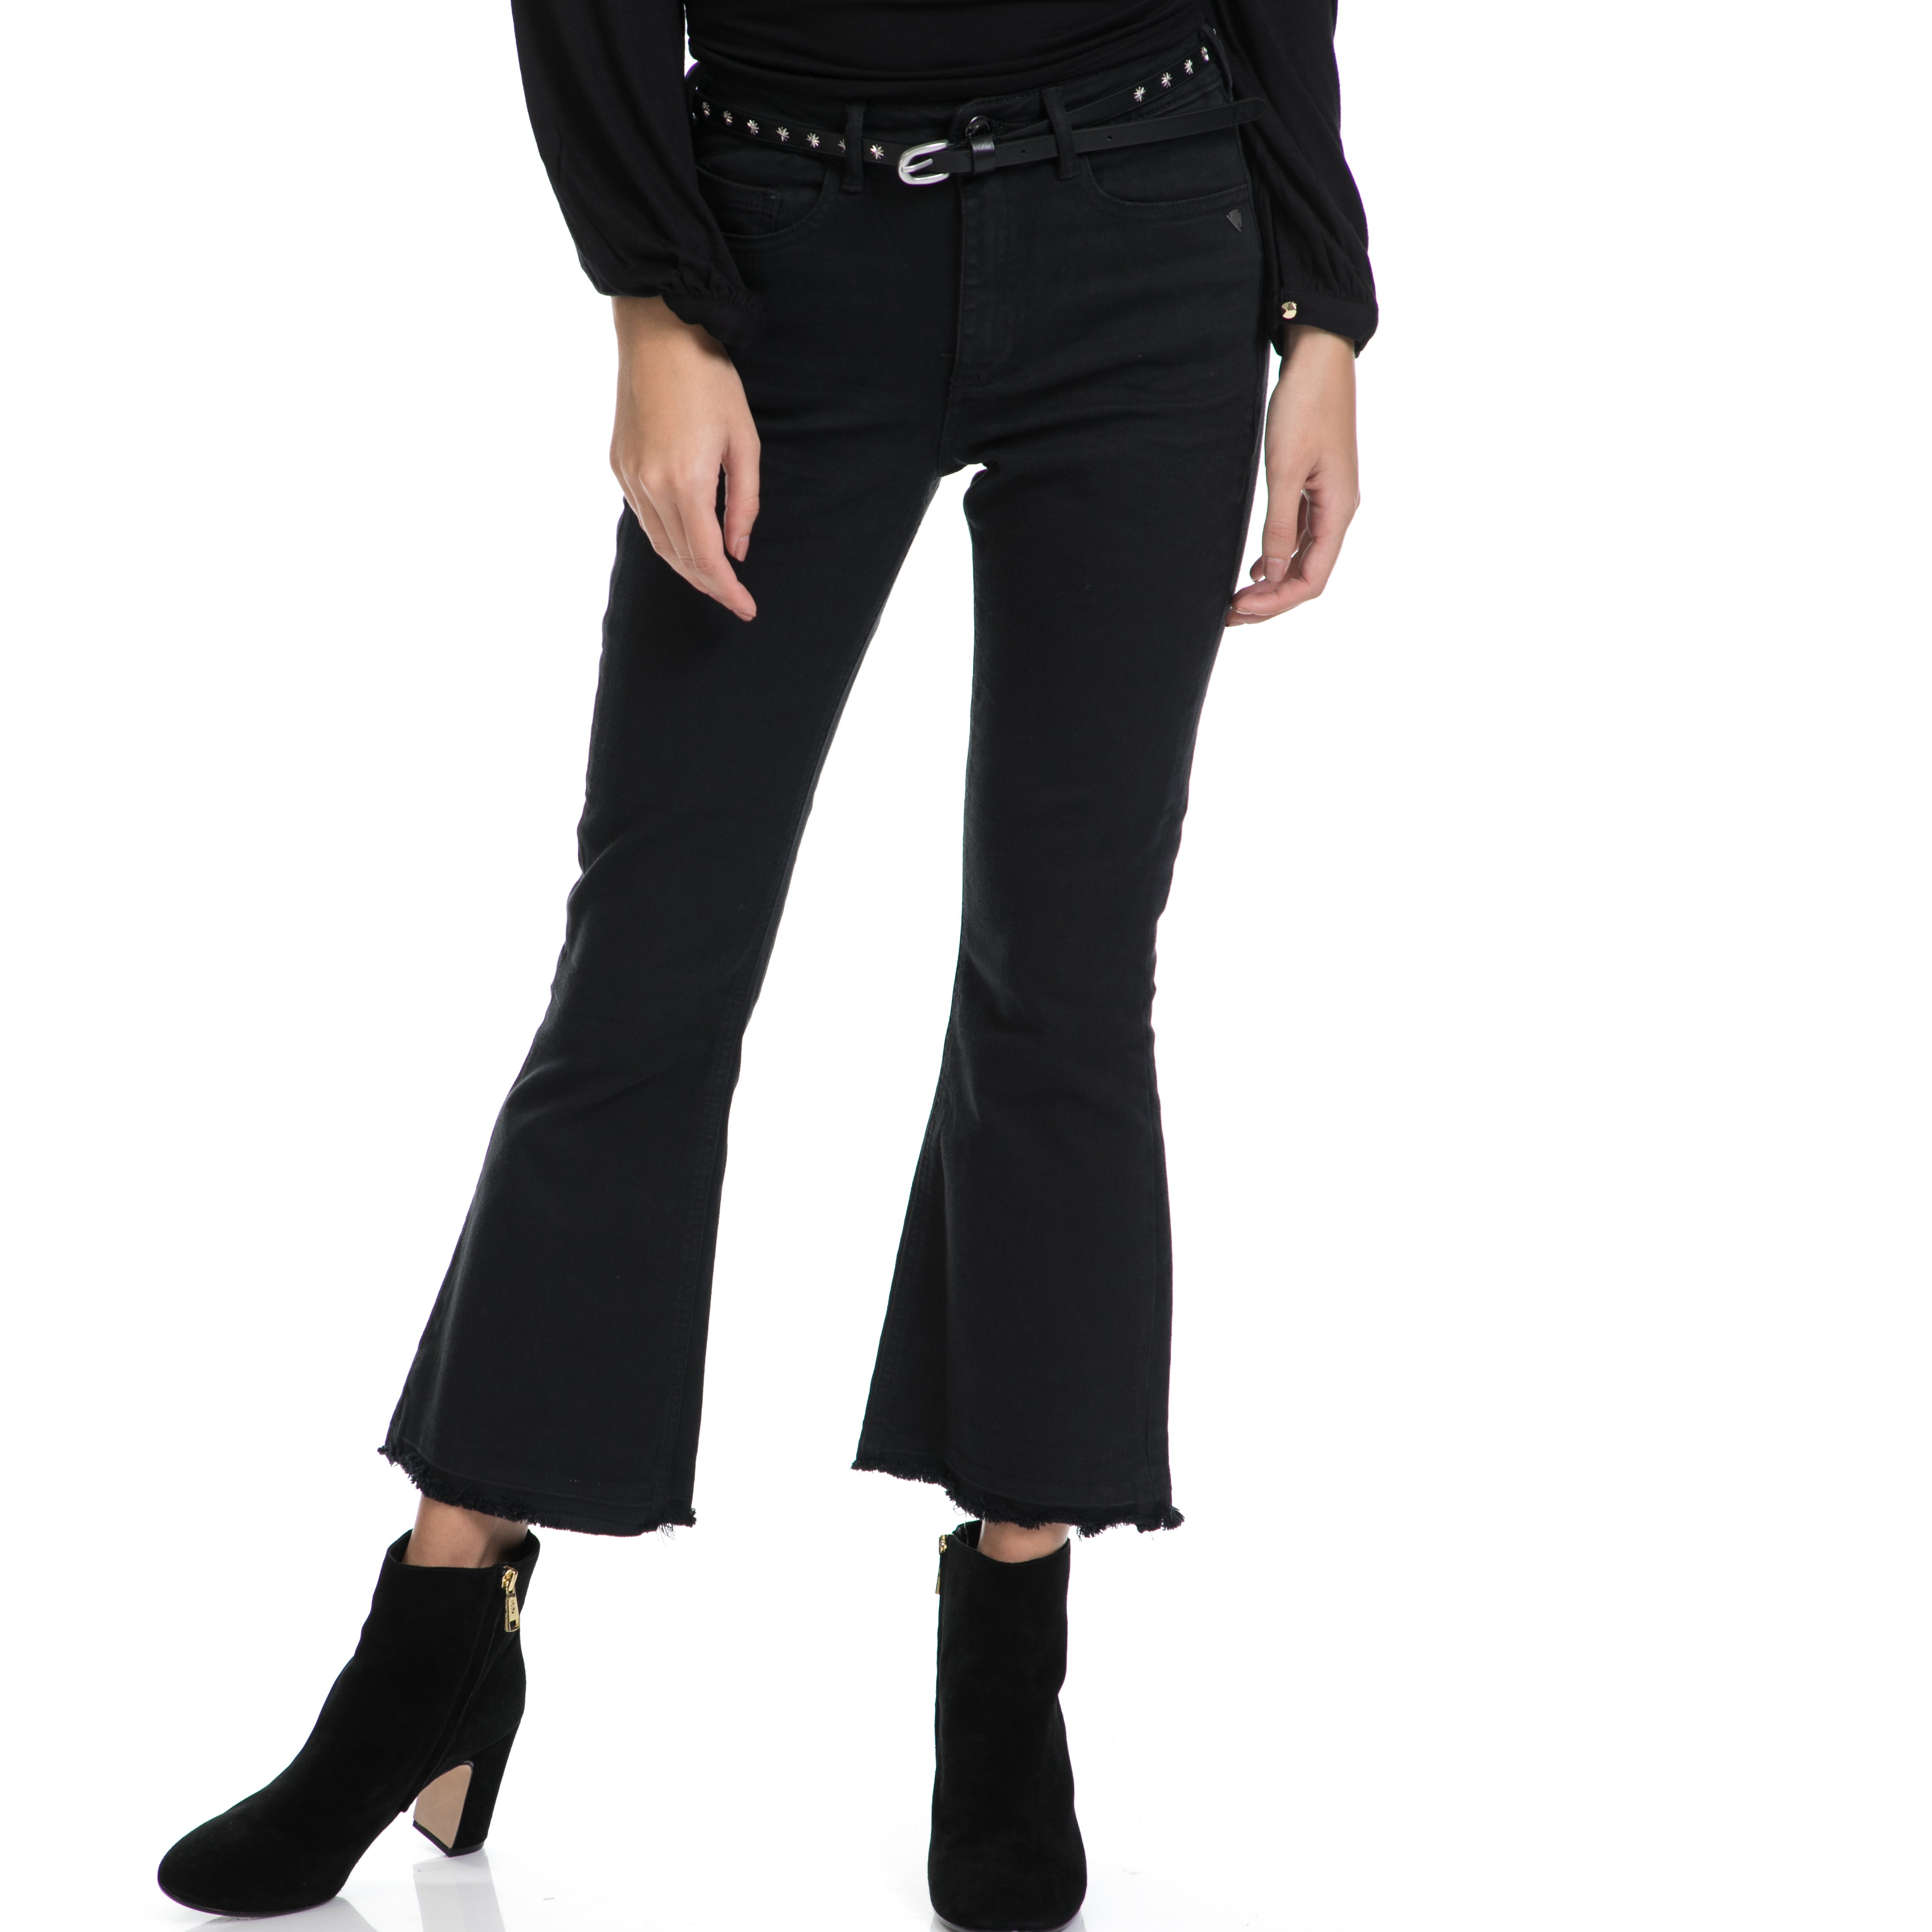 MAISON SCOTCH – Γυναικείο τζιν παντελόνι New Bowie MAISON SCOTCH μαύρο